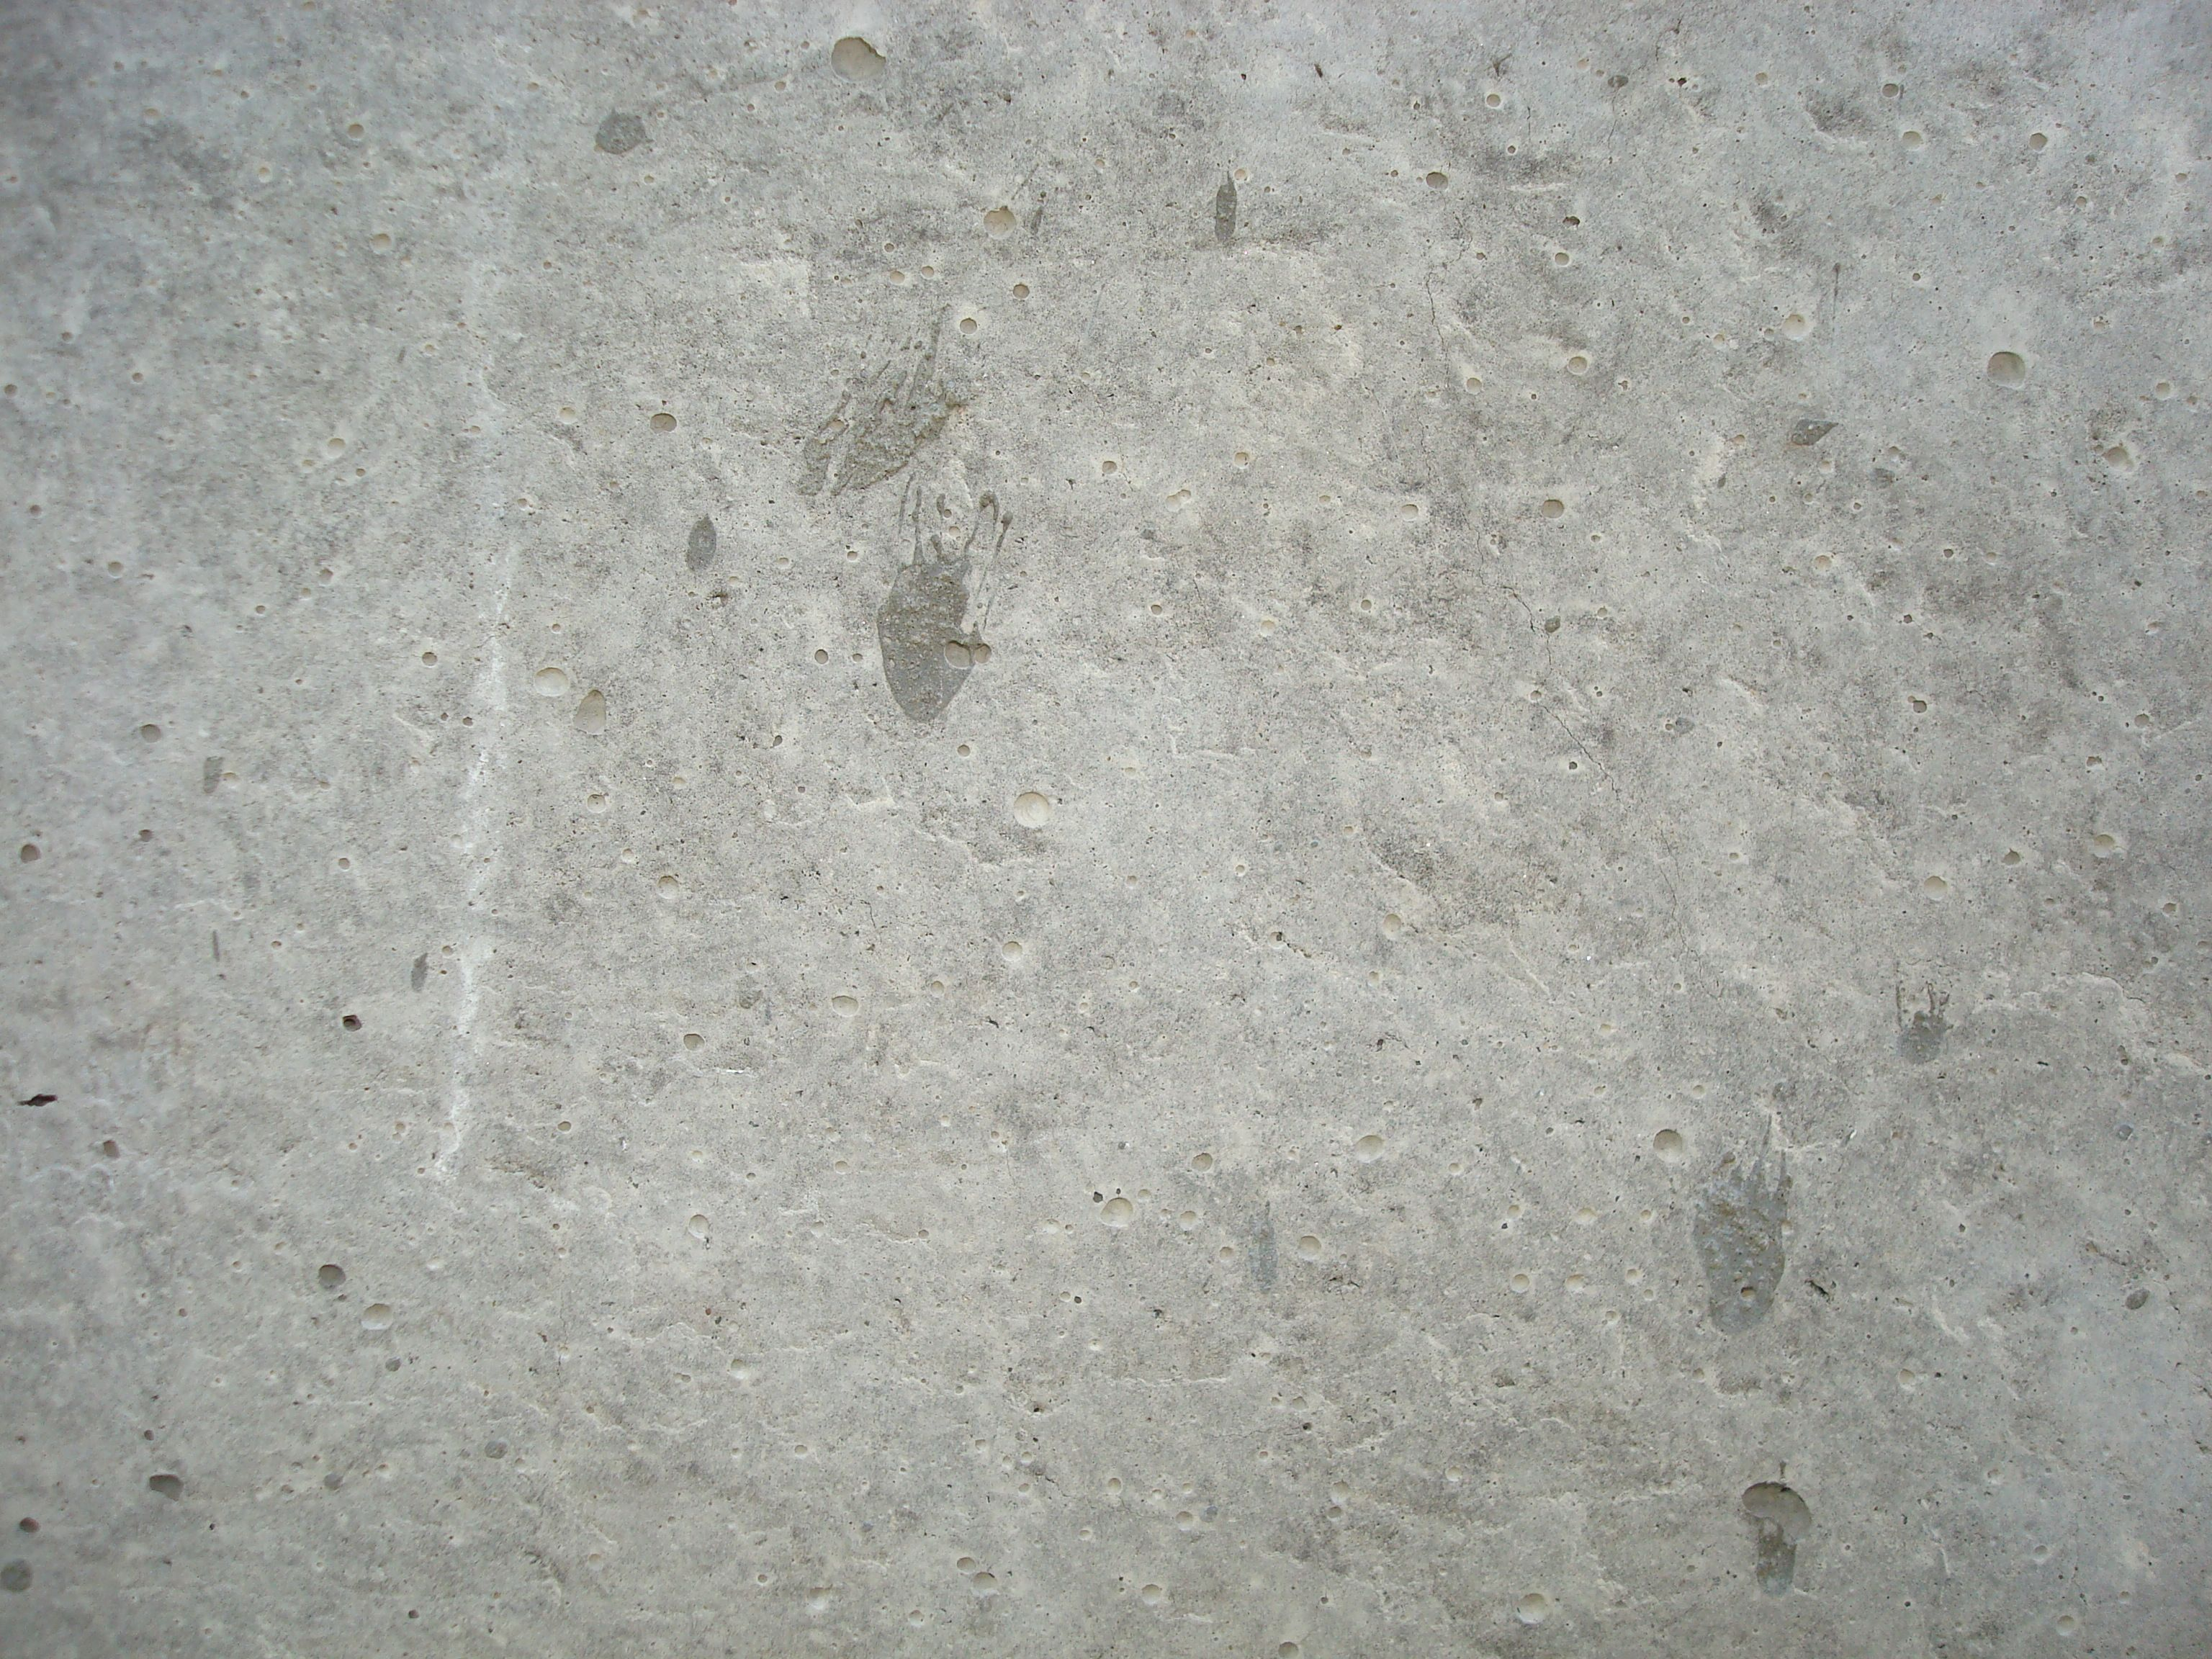 Concrete Textures Concrete Texture Texture Concrete